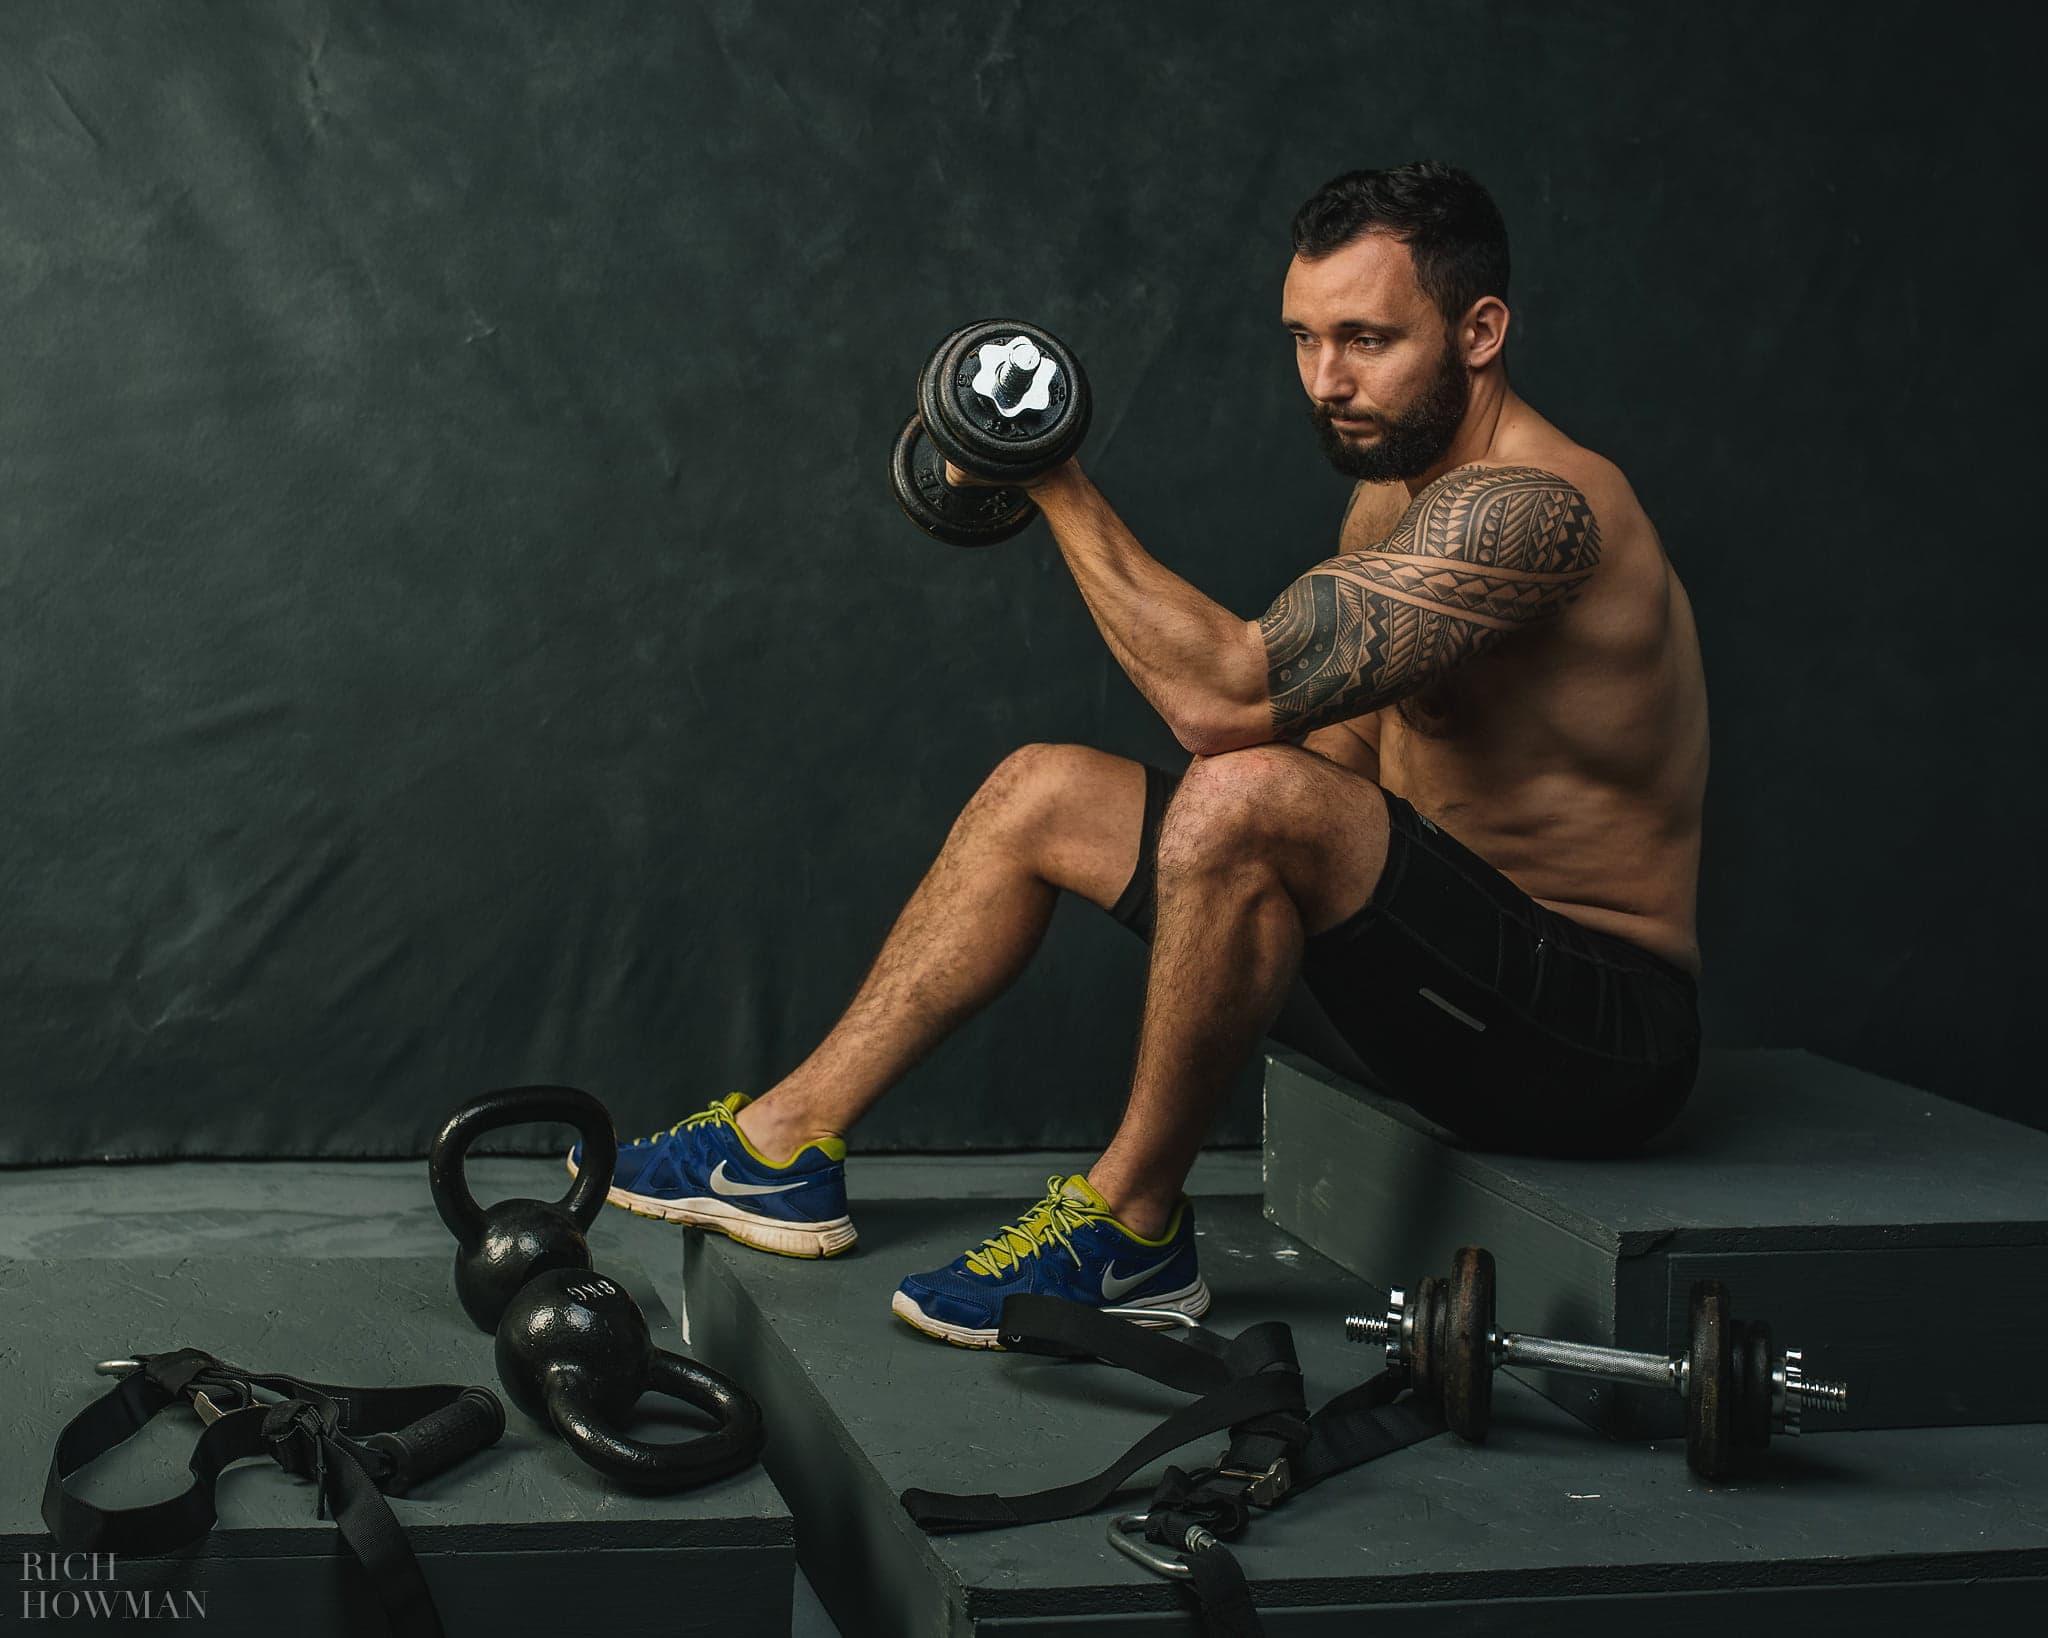 Athletics & Sports Photographer 3